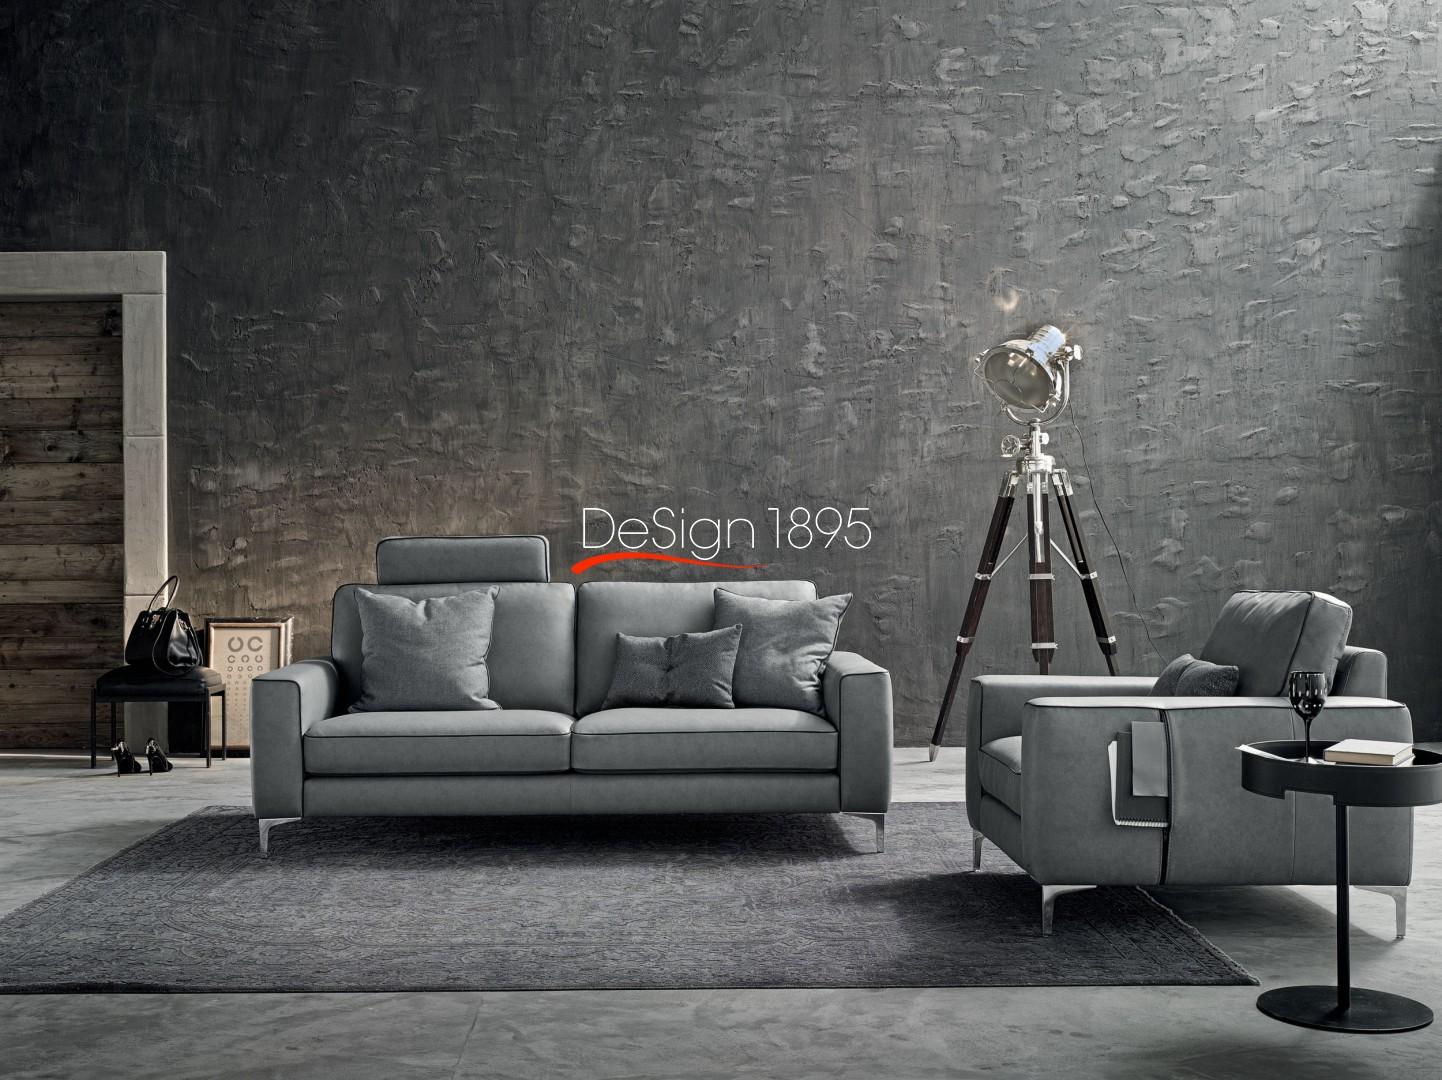 Stunning Le Confort Divani Contemporary - Amazing House Design ...